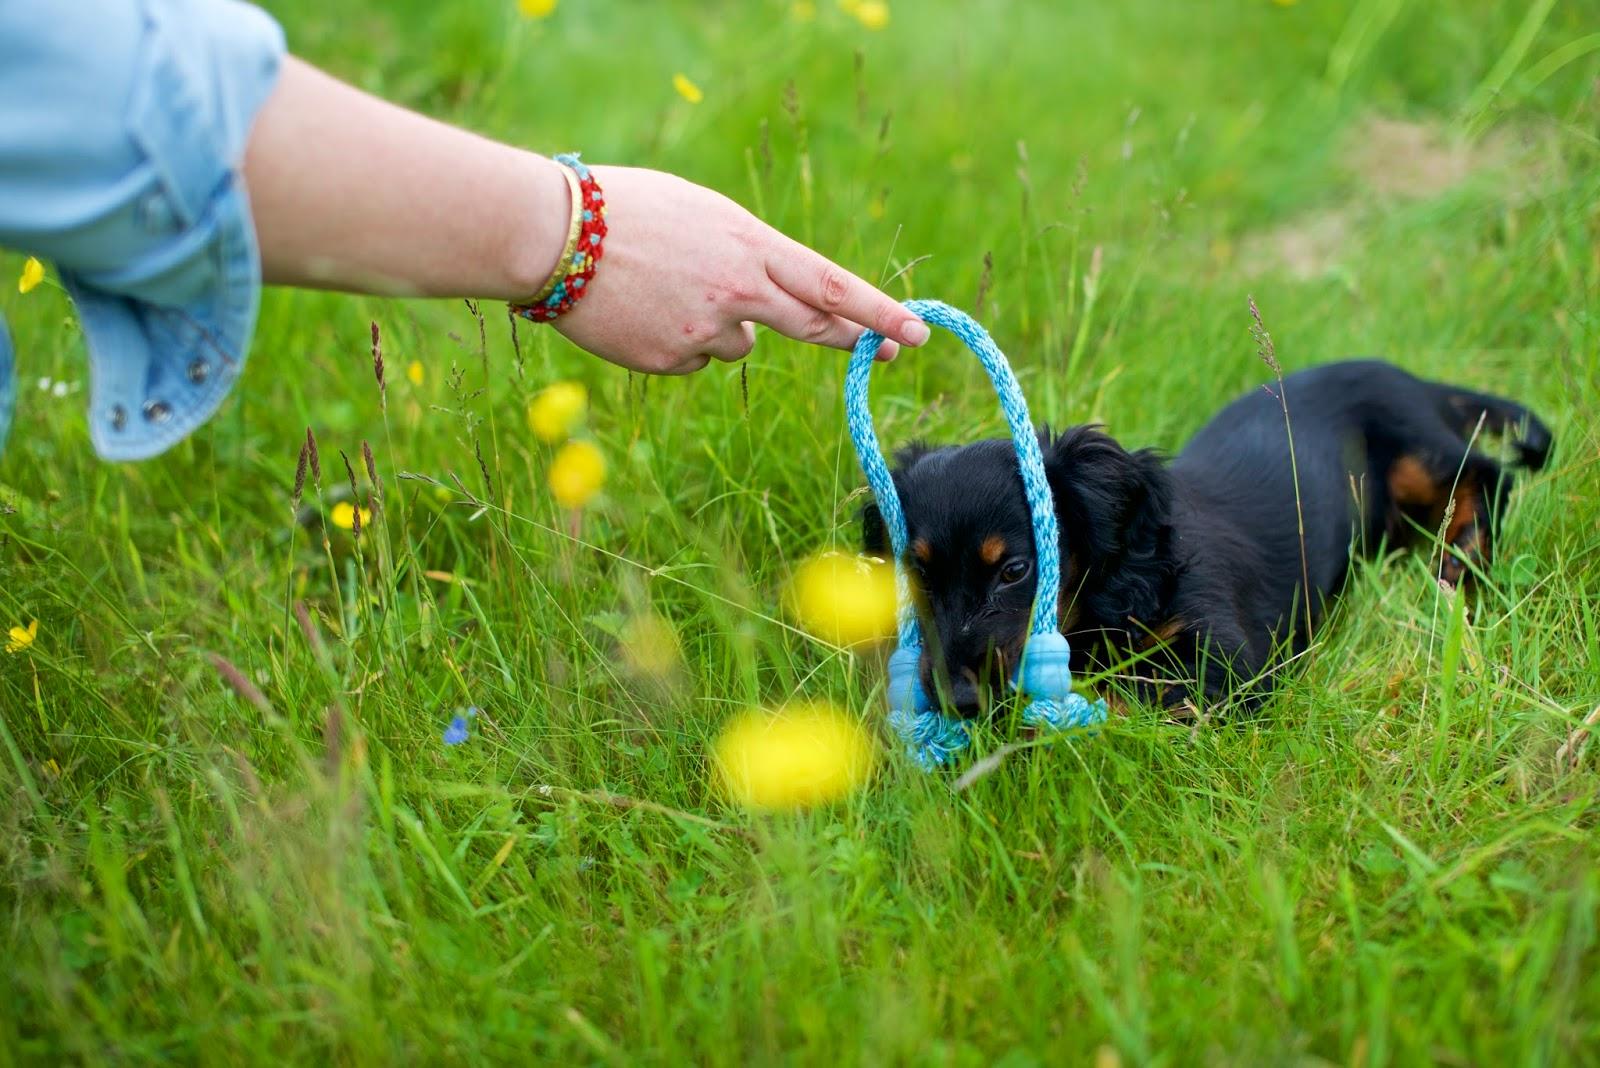 liquidgrain liquid grain dog puppy hetty teething toy treats feedem